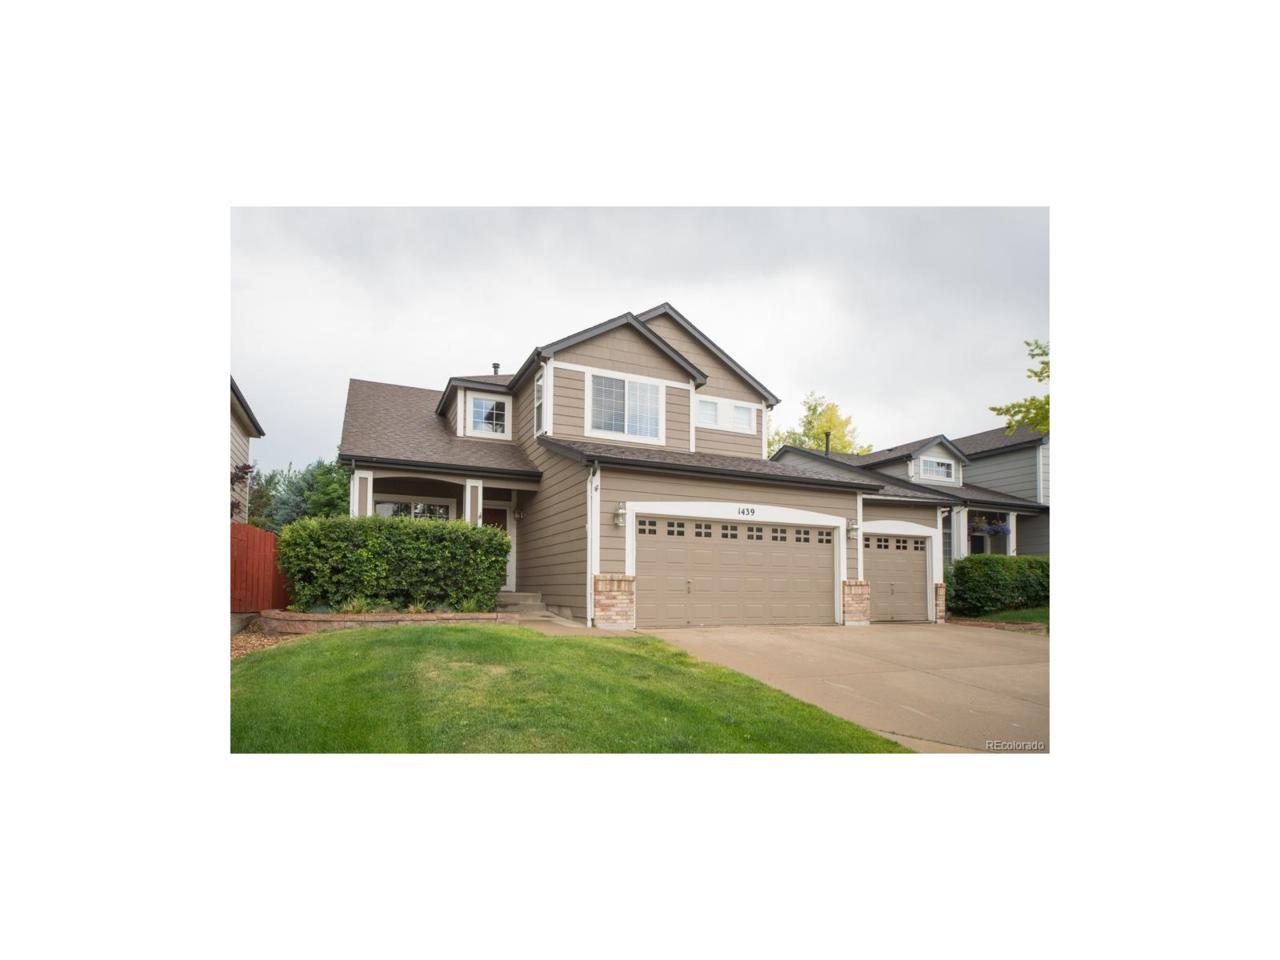 1439 Chukar Drive, Longmont, CO 80504 (MLS #2087723) :: 8z Real Estate